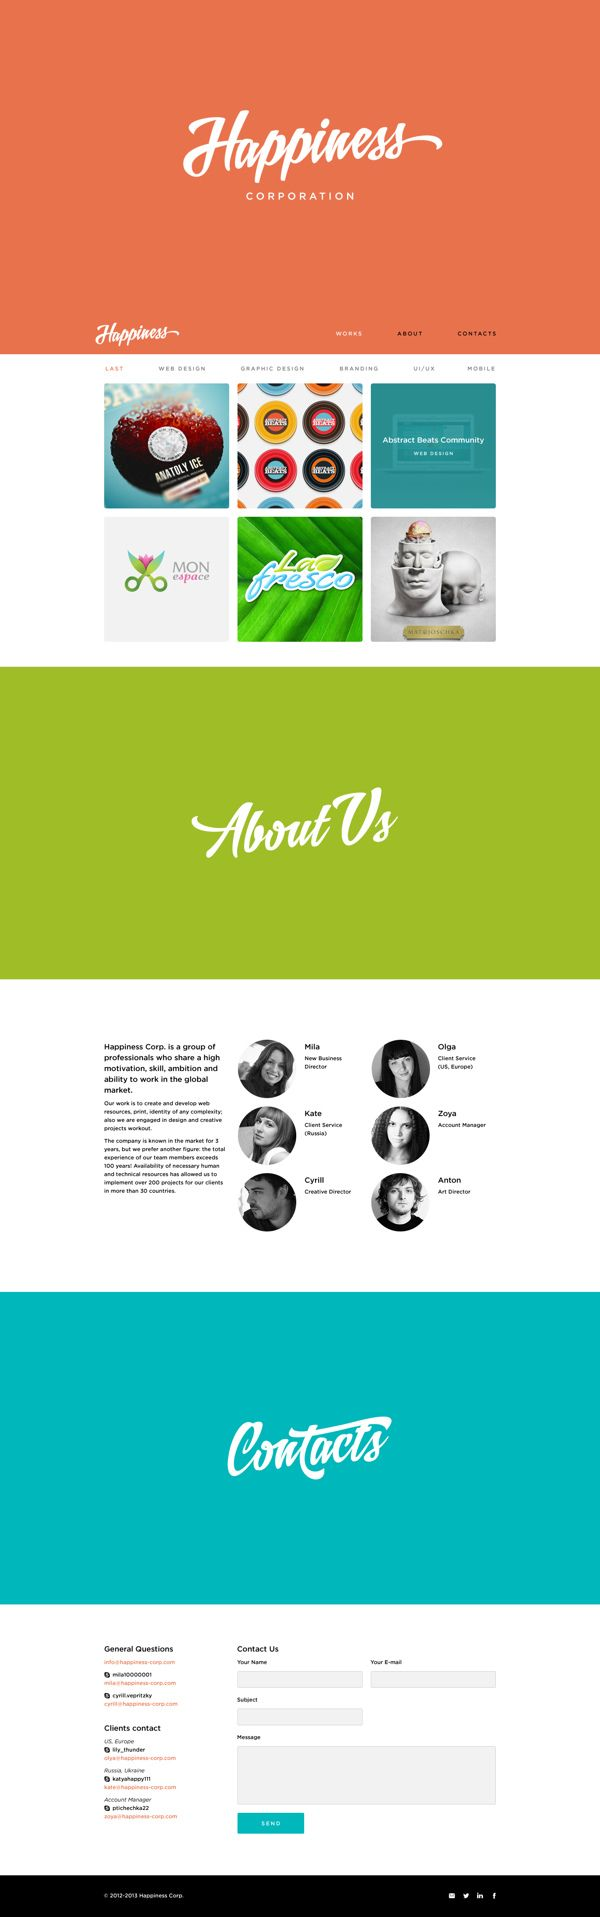 Happiness Corporation Website #web #website #webdesign #scroll #onepage #portfolio  ☆★ 포트폴리오 참고